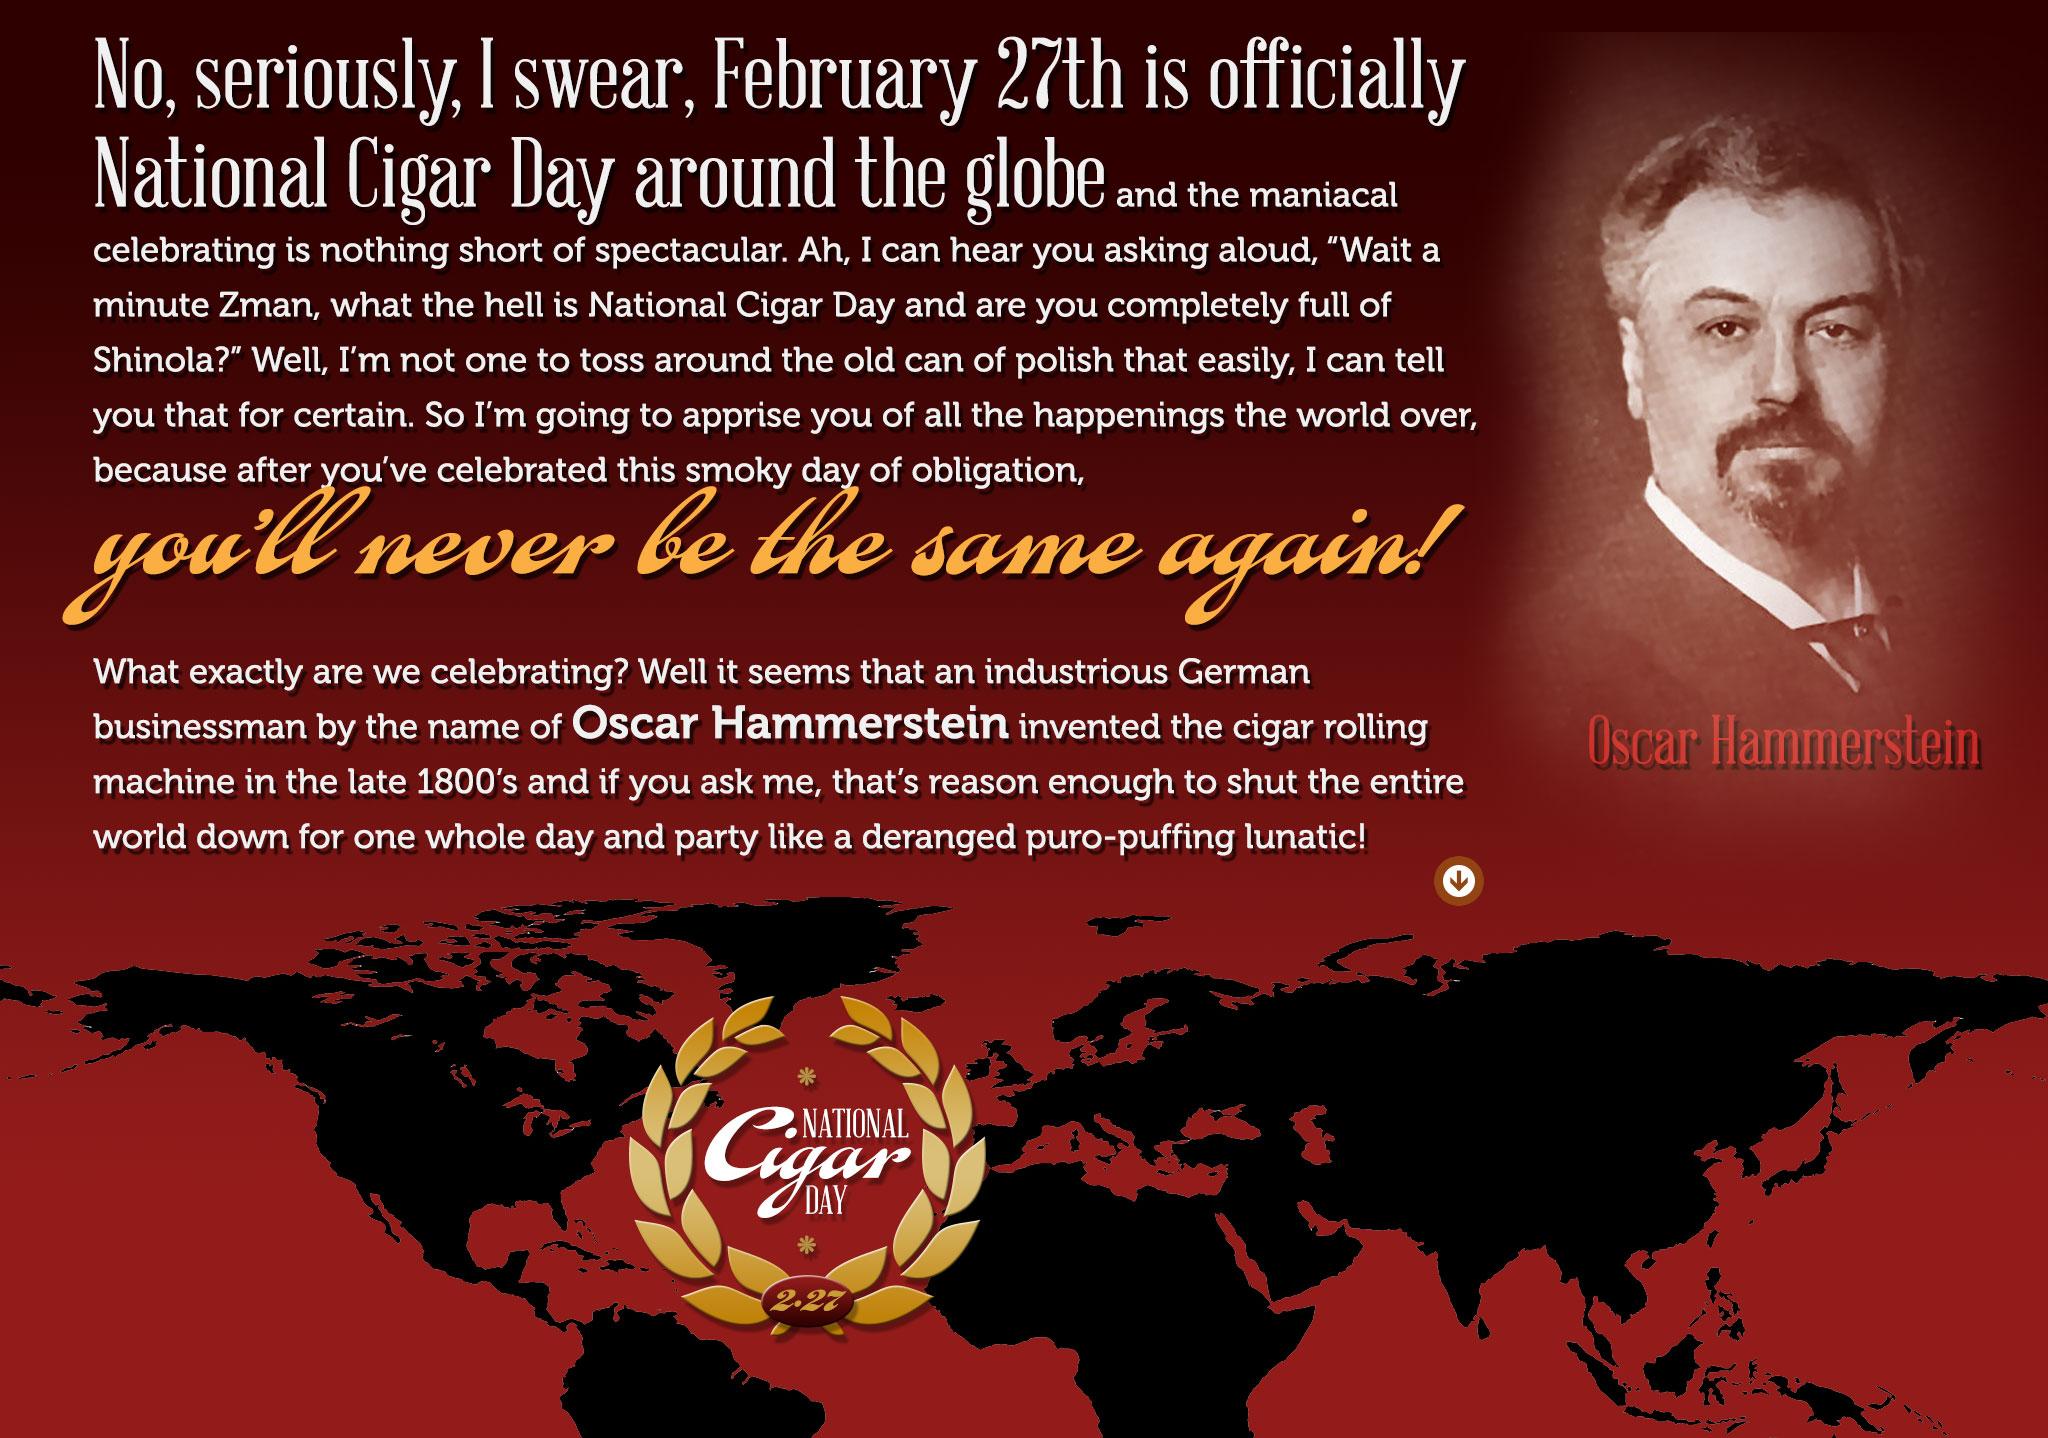 National Cigar Day History